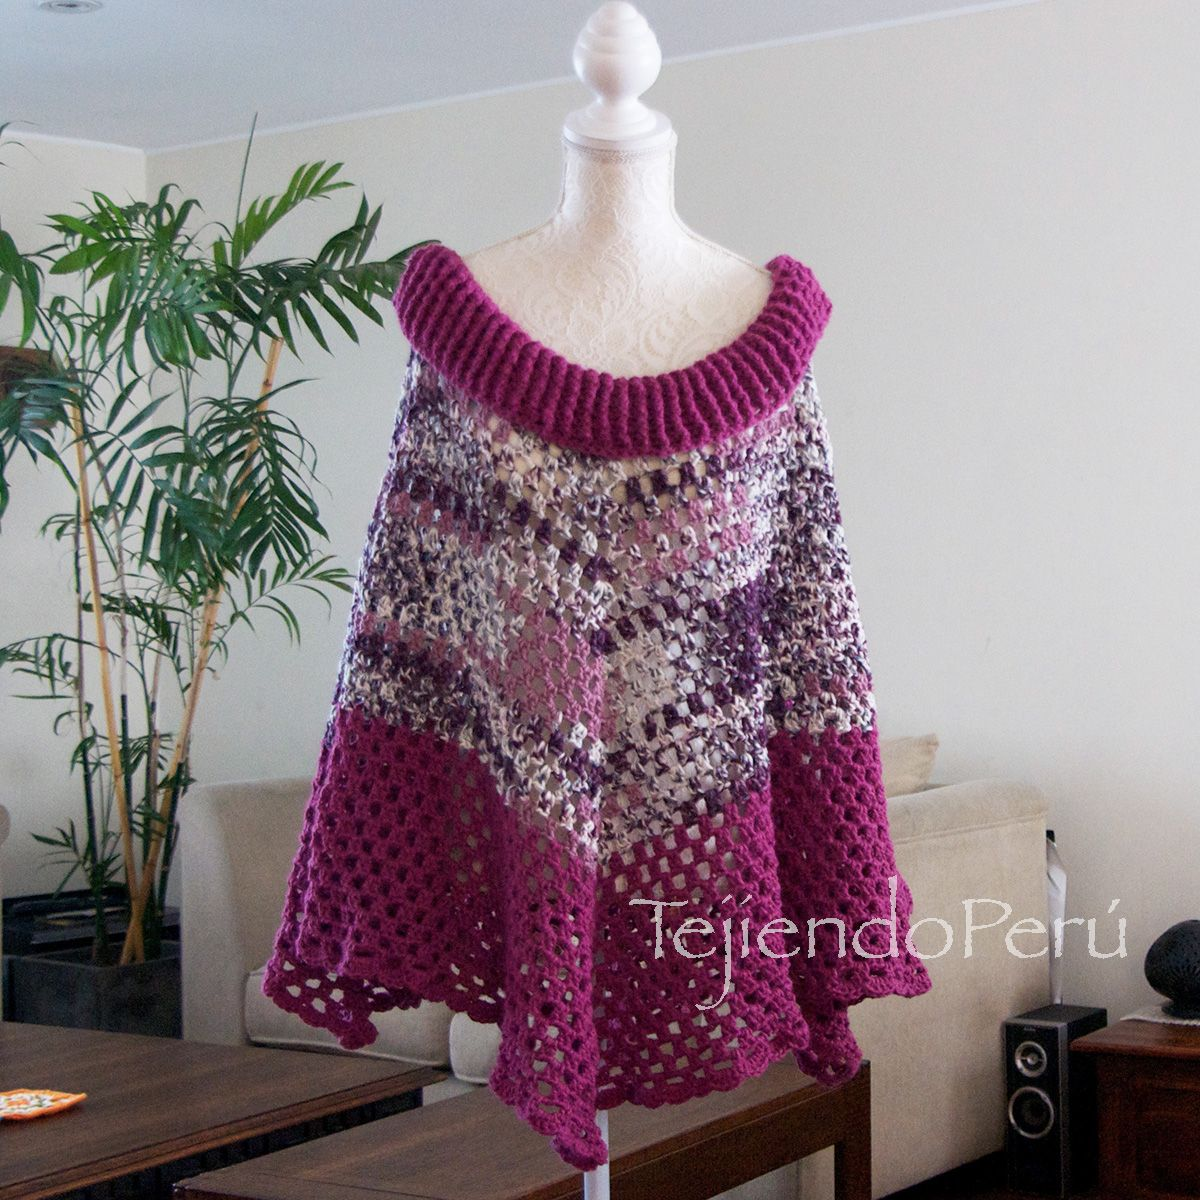 Poncho con cuello ancho tejido a crochet súper fácil! Video tutorial ...